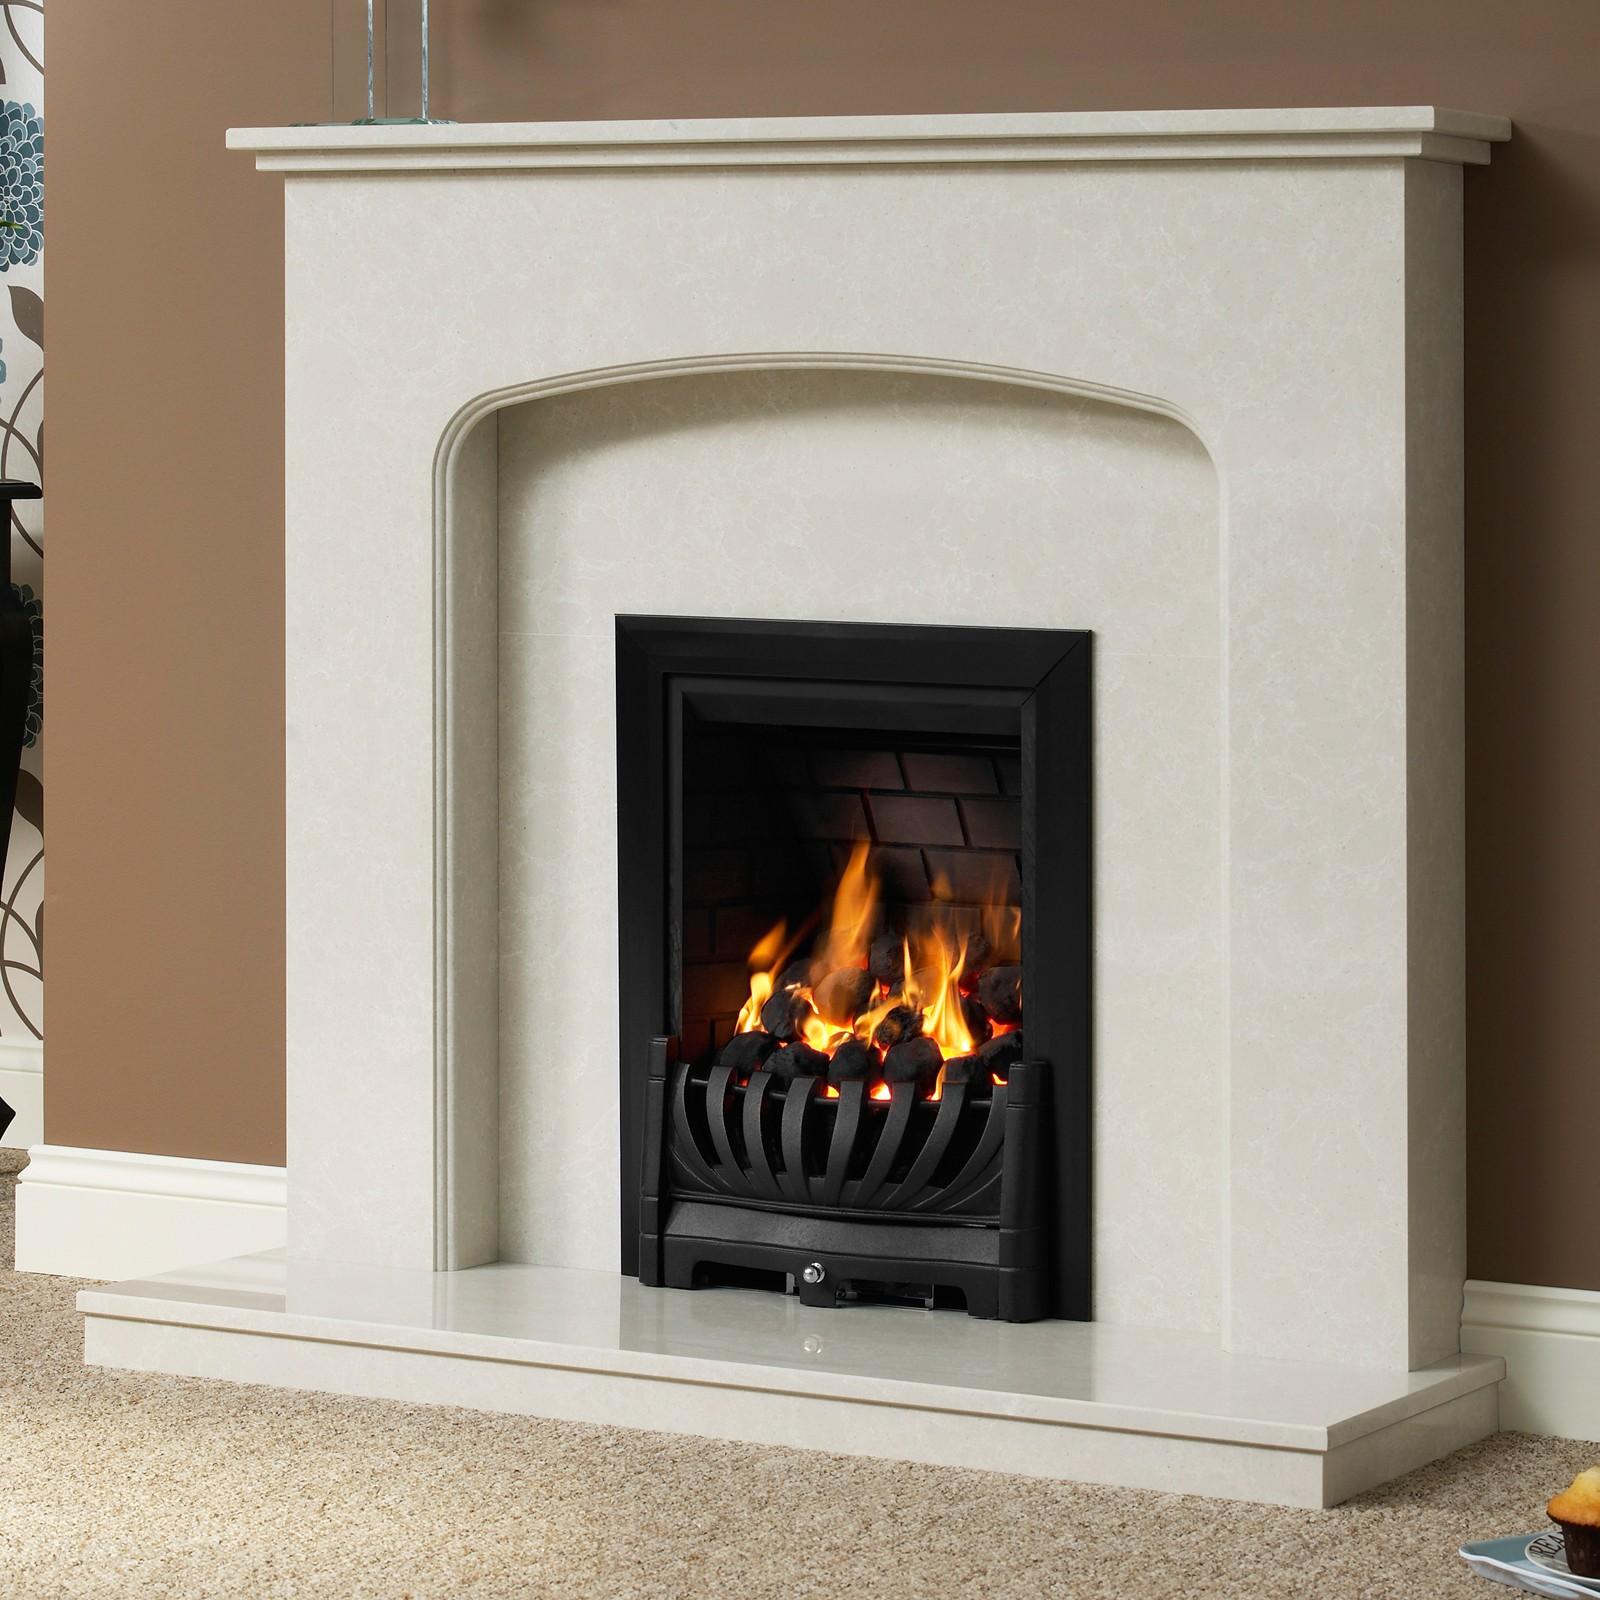 Monica Wants It: A Lifestyle Blog: DIY Marble Fireplace & Mantel ...